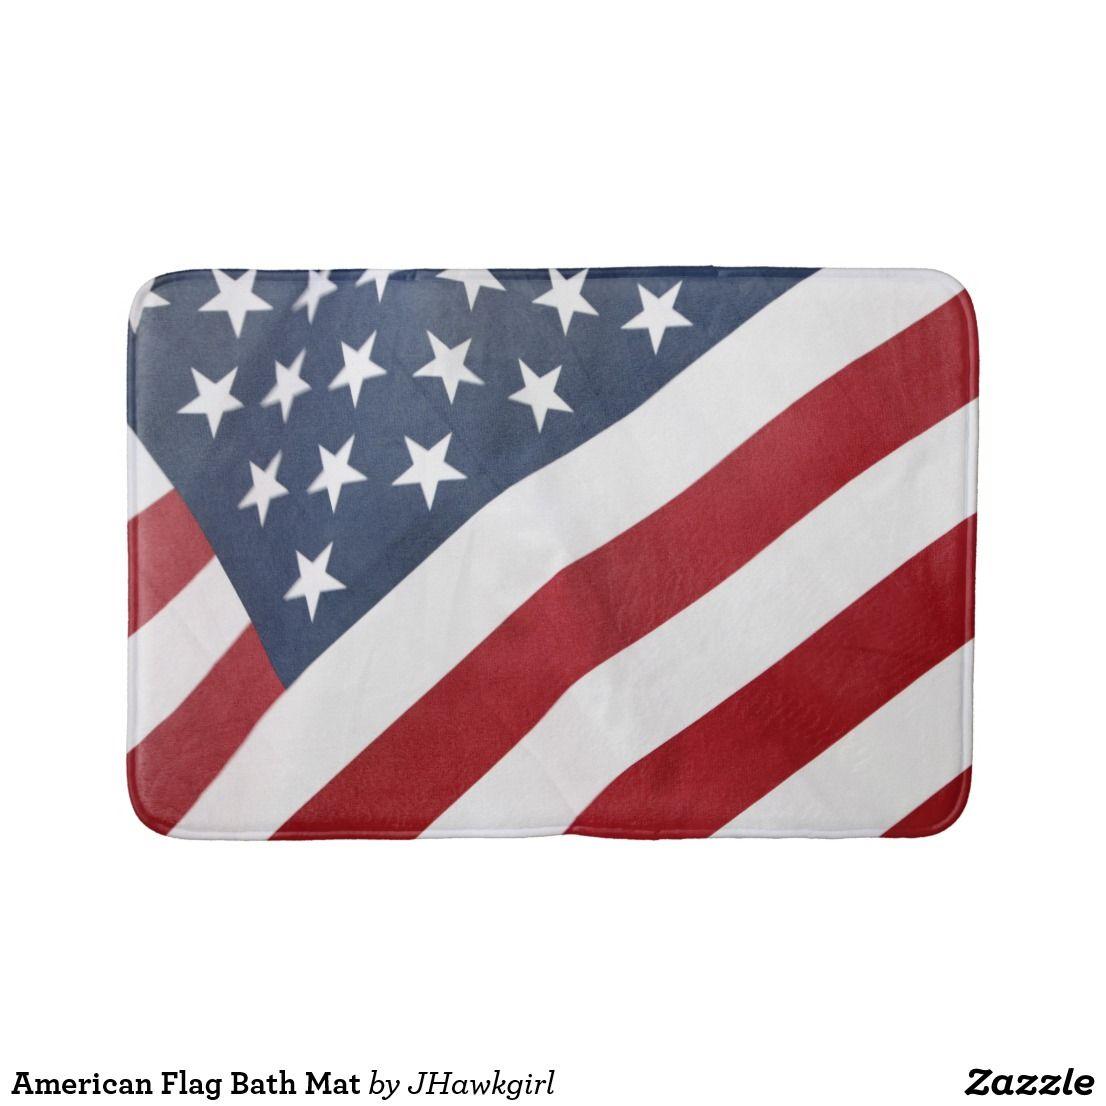 American Flag Bath Mat Zazzle Com American Flag Flag Patriotic Holidays